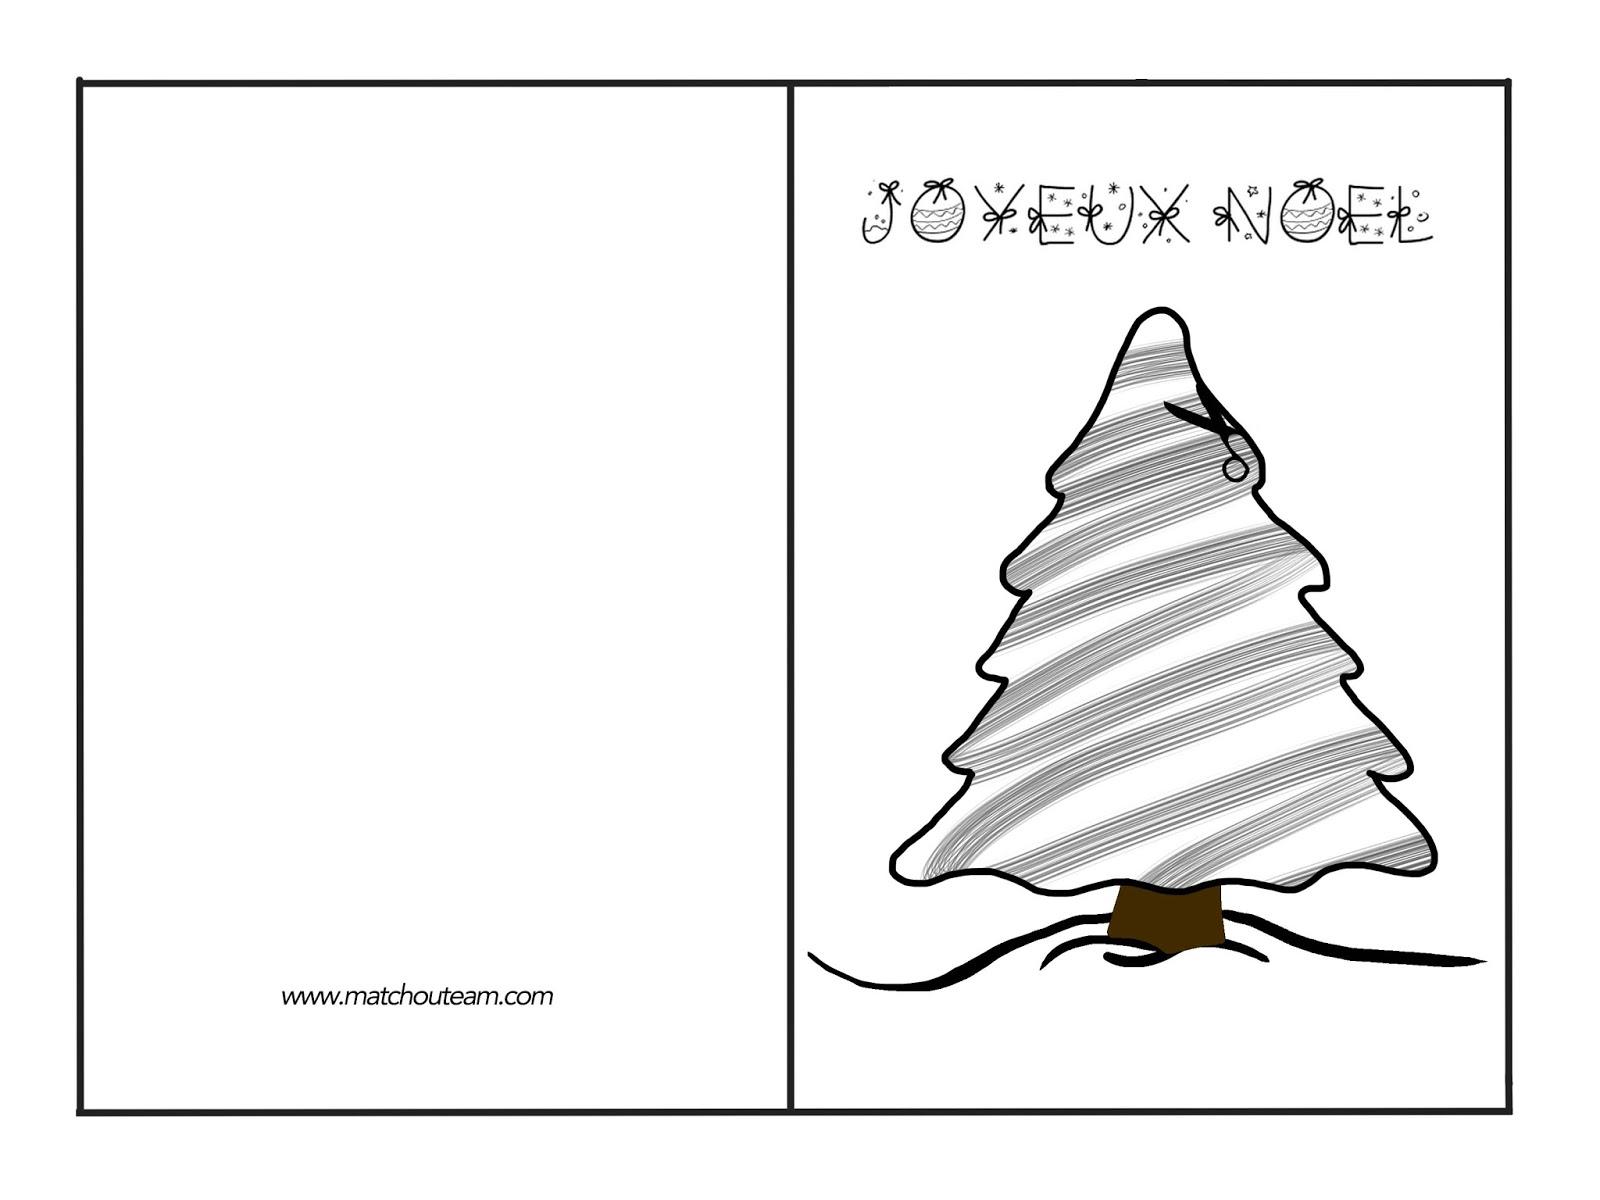 Ma Carte De Noel.Ma Tchou Team Carte Joyeux Noël